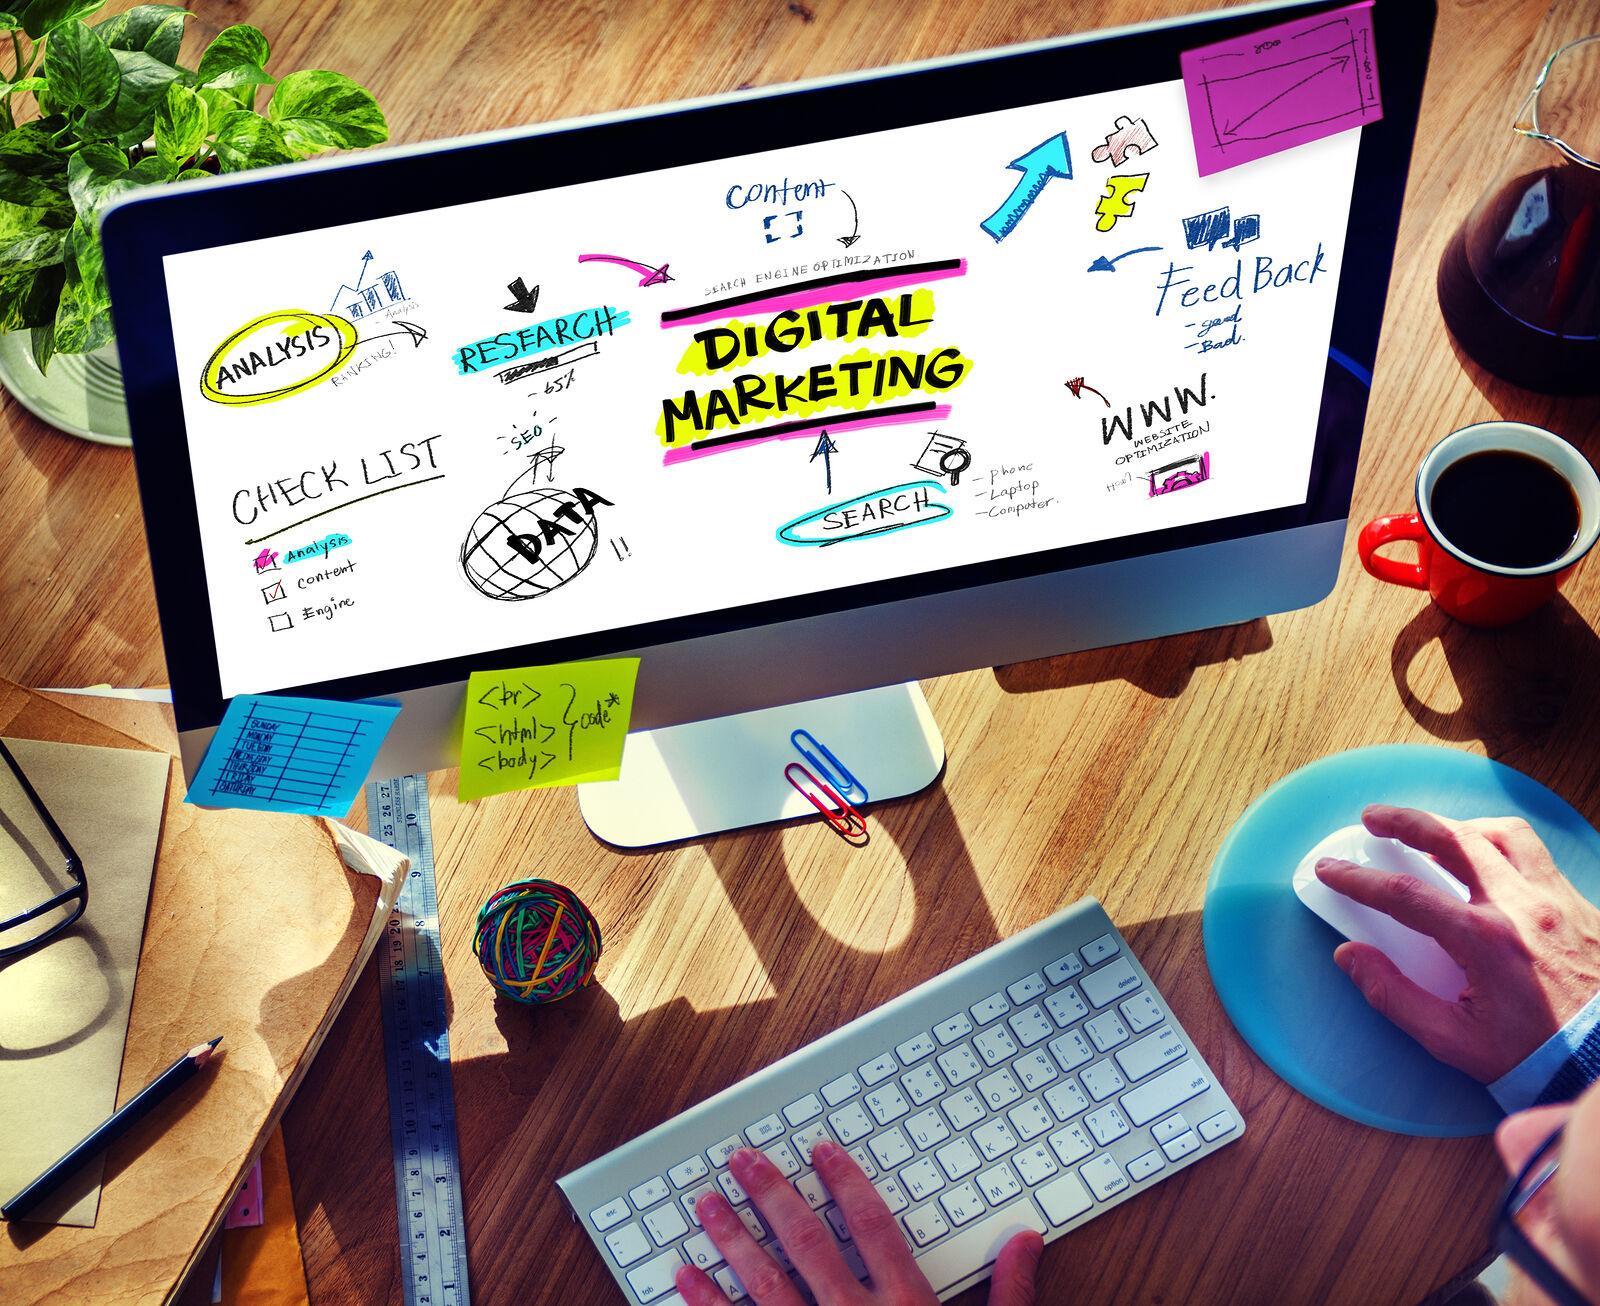 Digital Marketing Trends for 2014